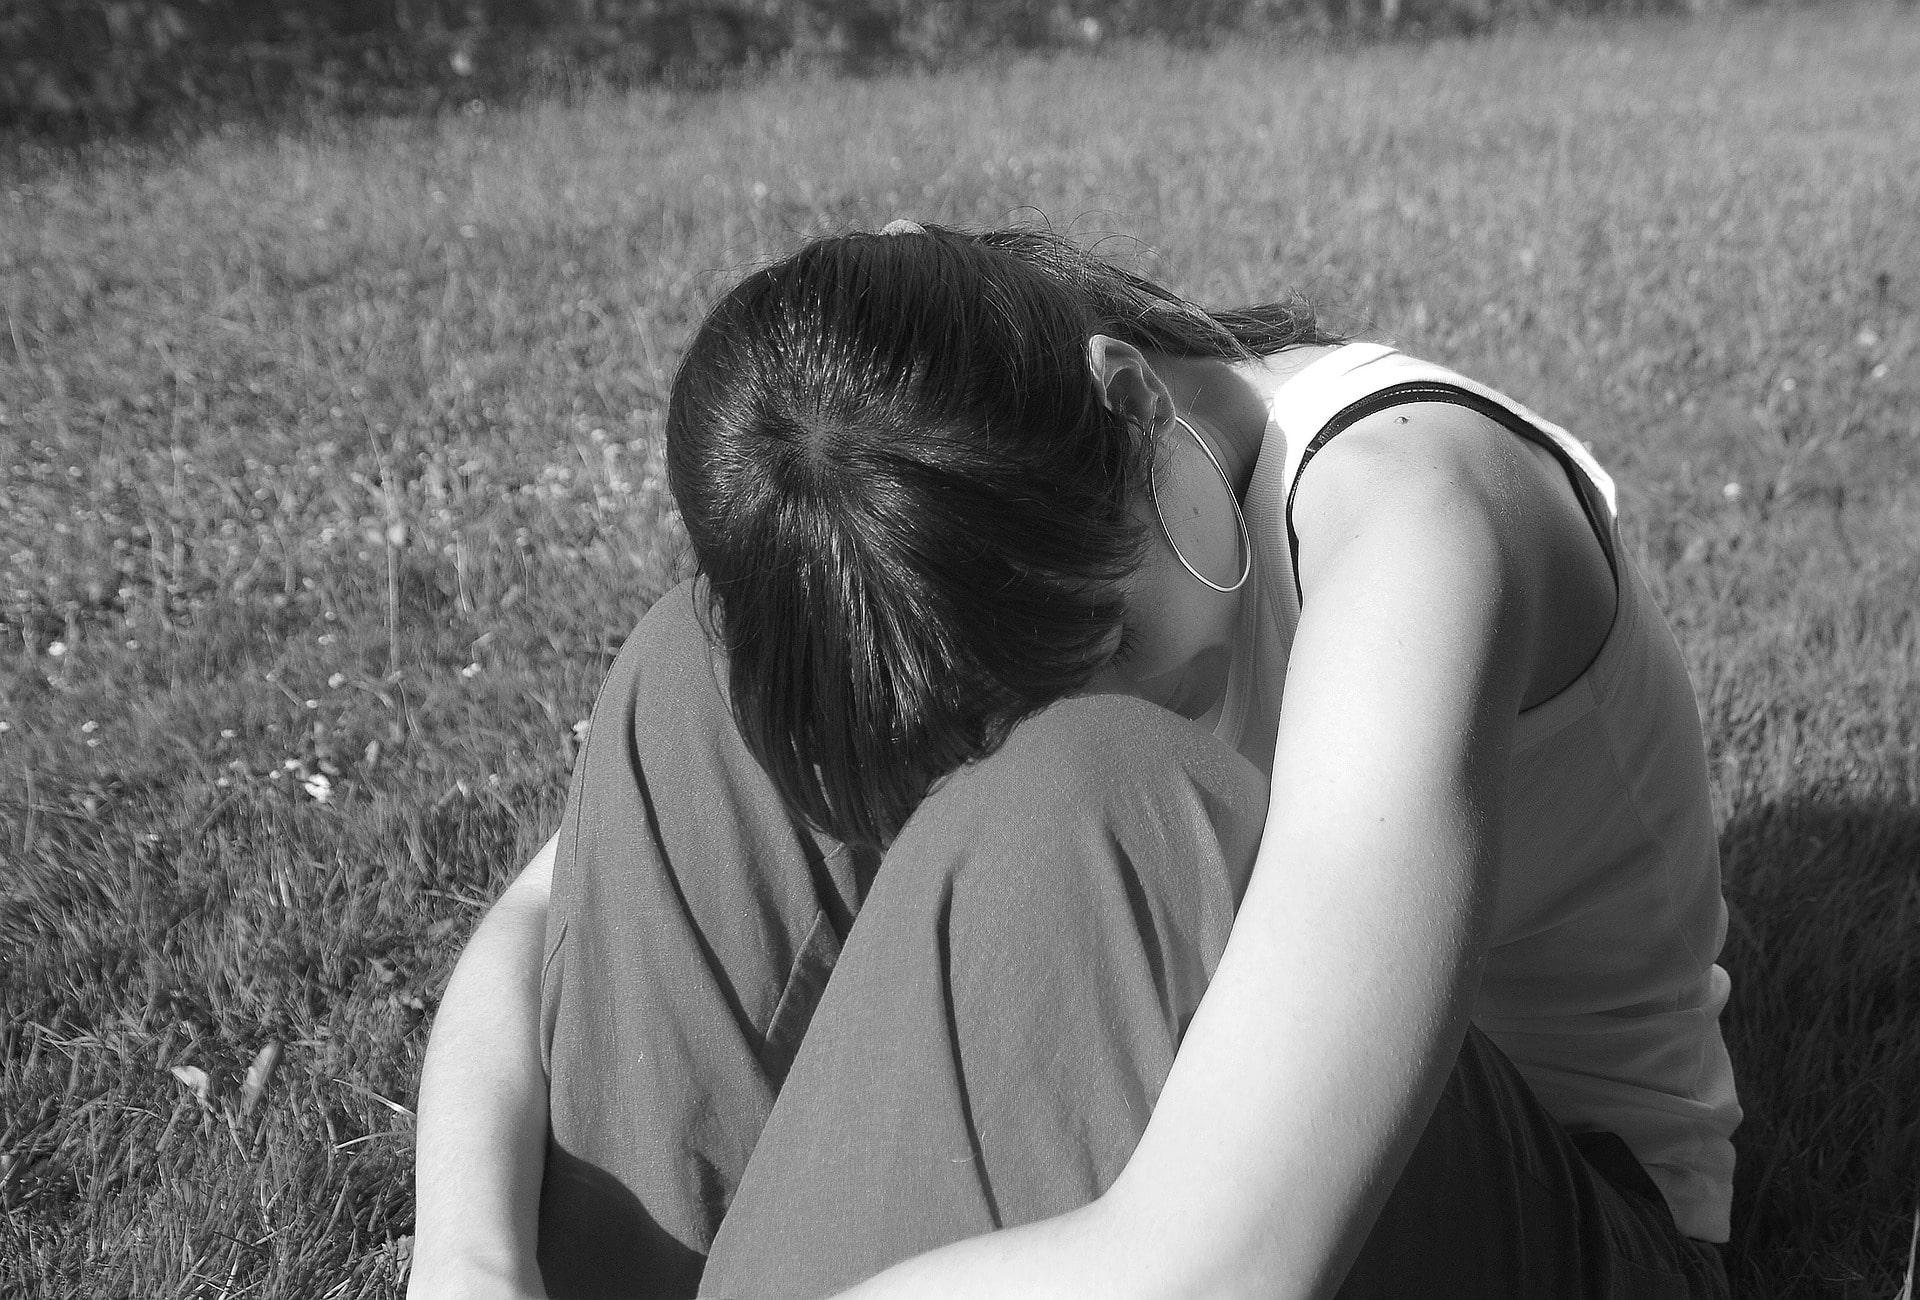 Treating Trauma and Addiction